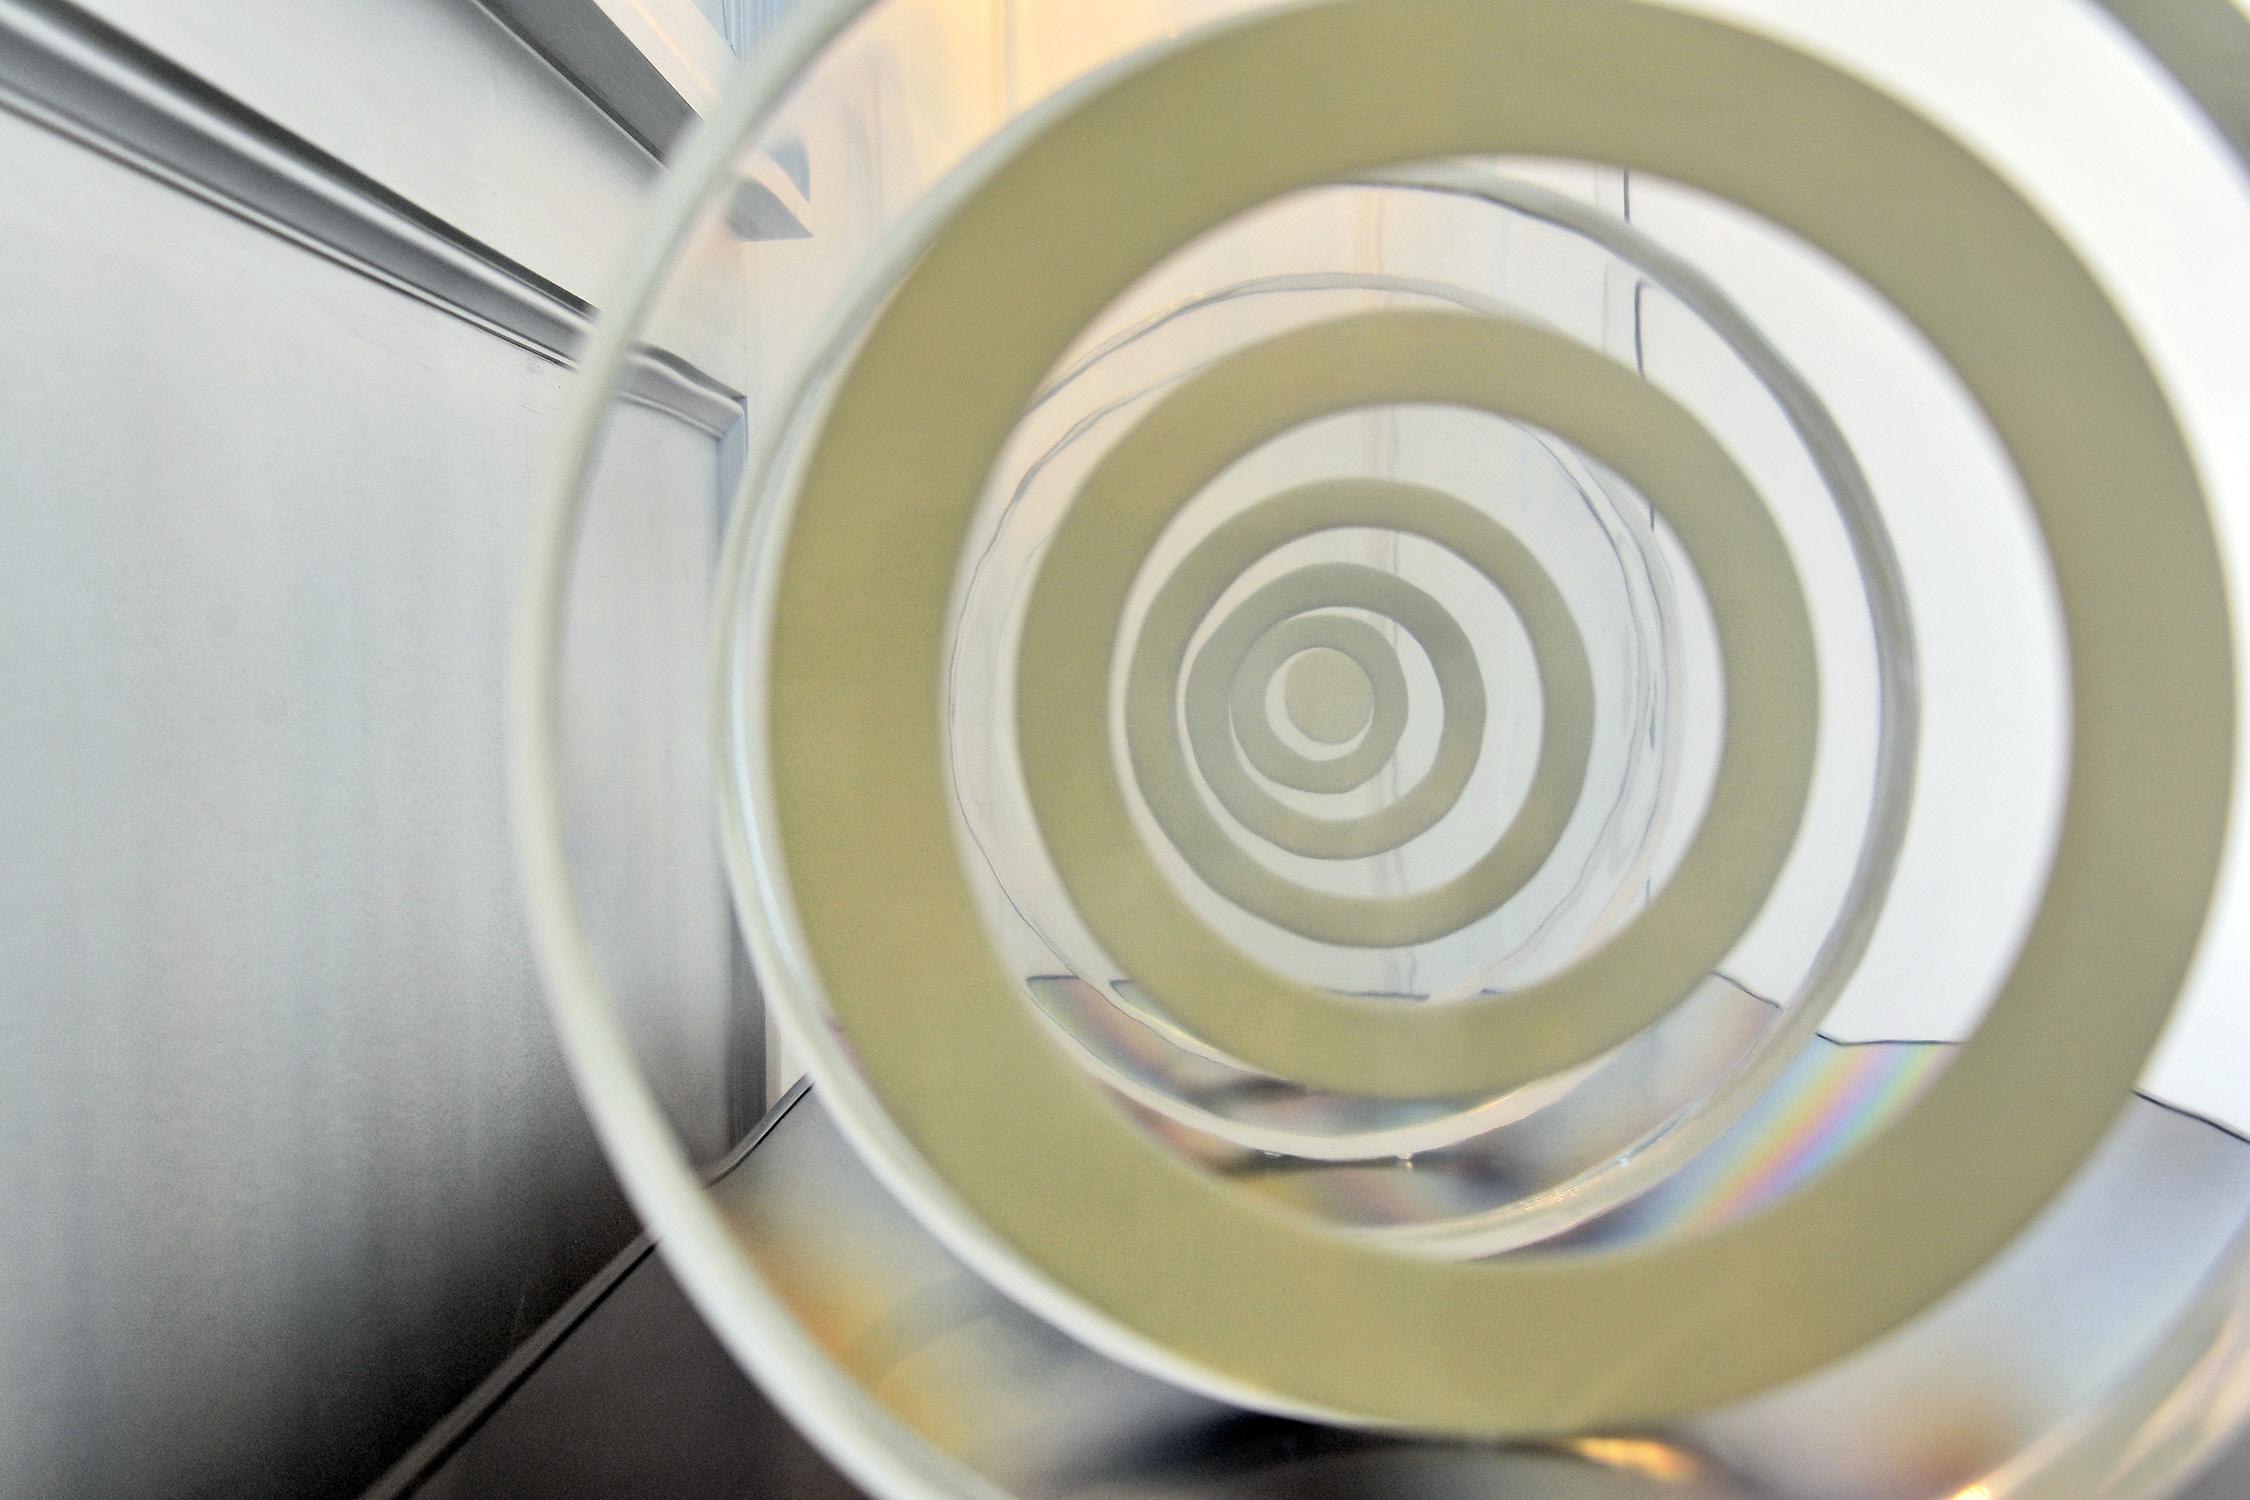 Spyglass Series